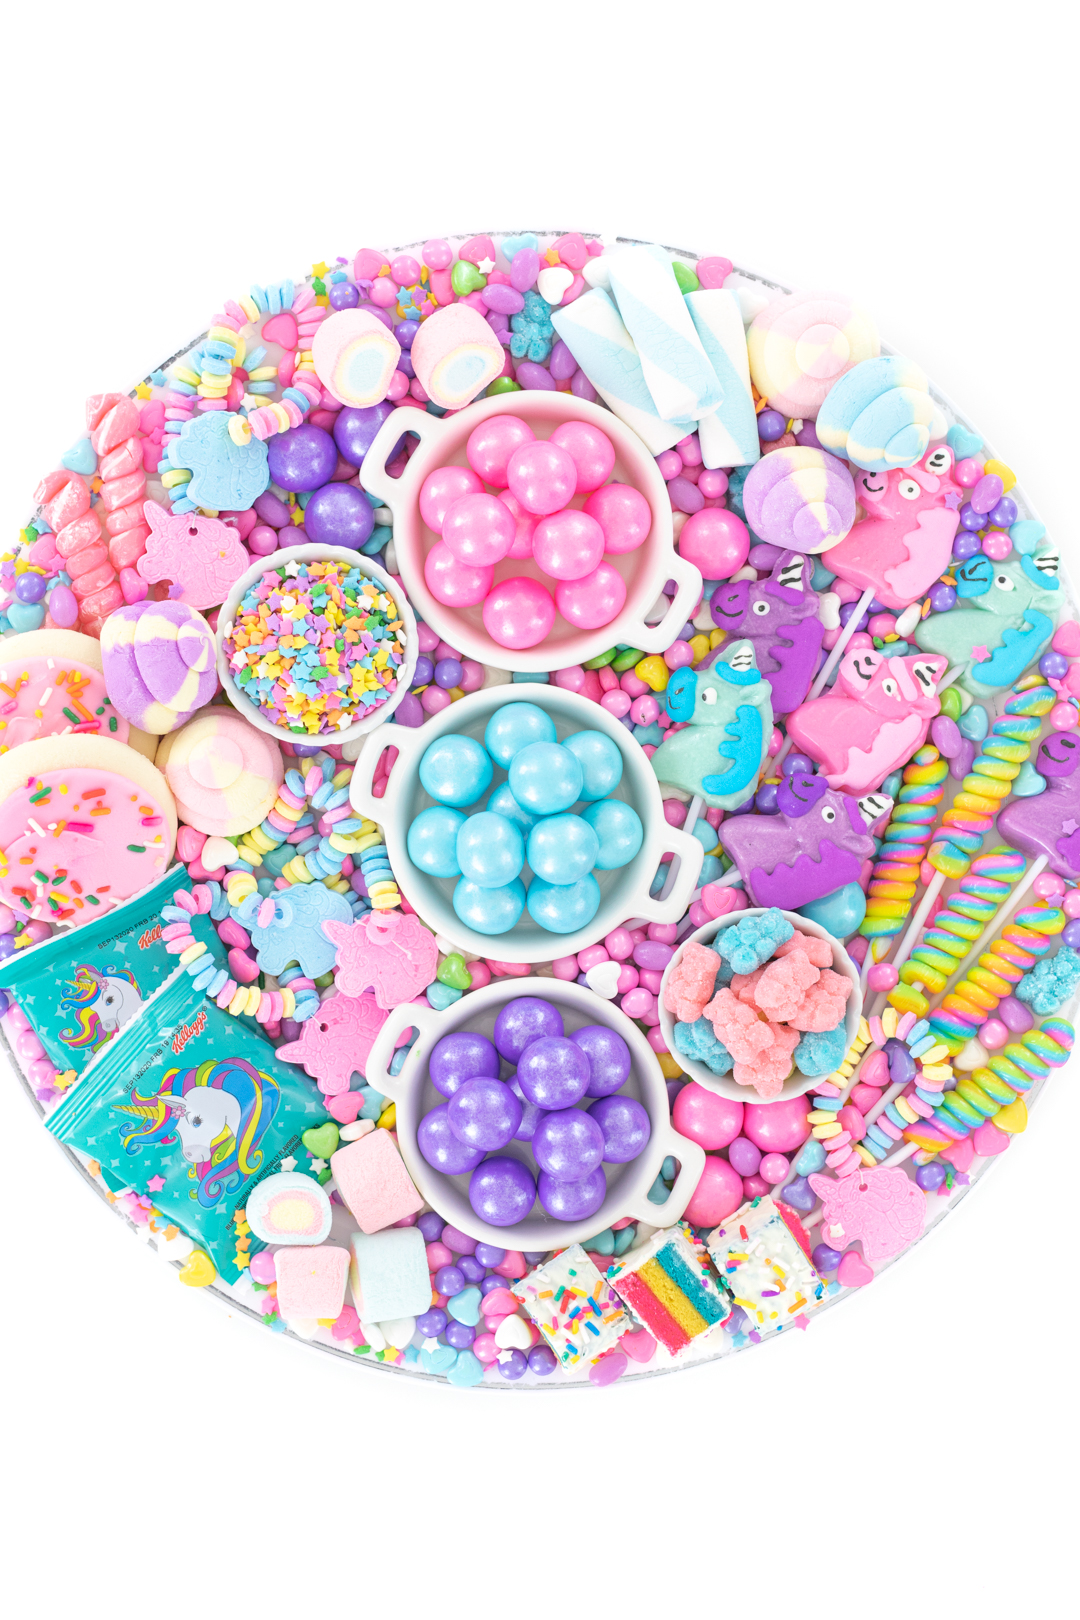 unicorn charcuterie board with pastel unicorn shaped candy